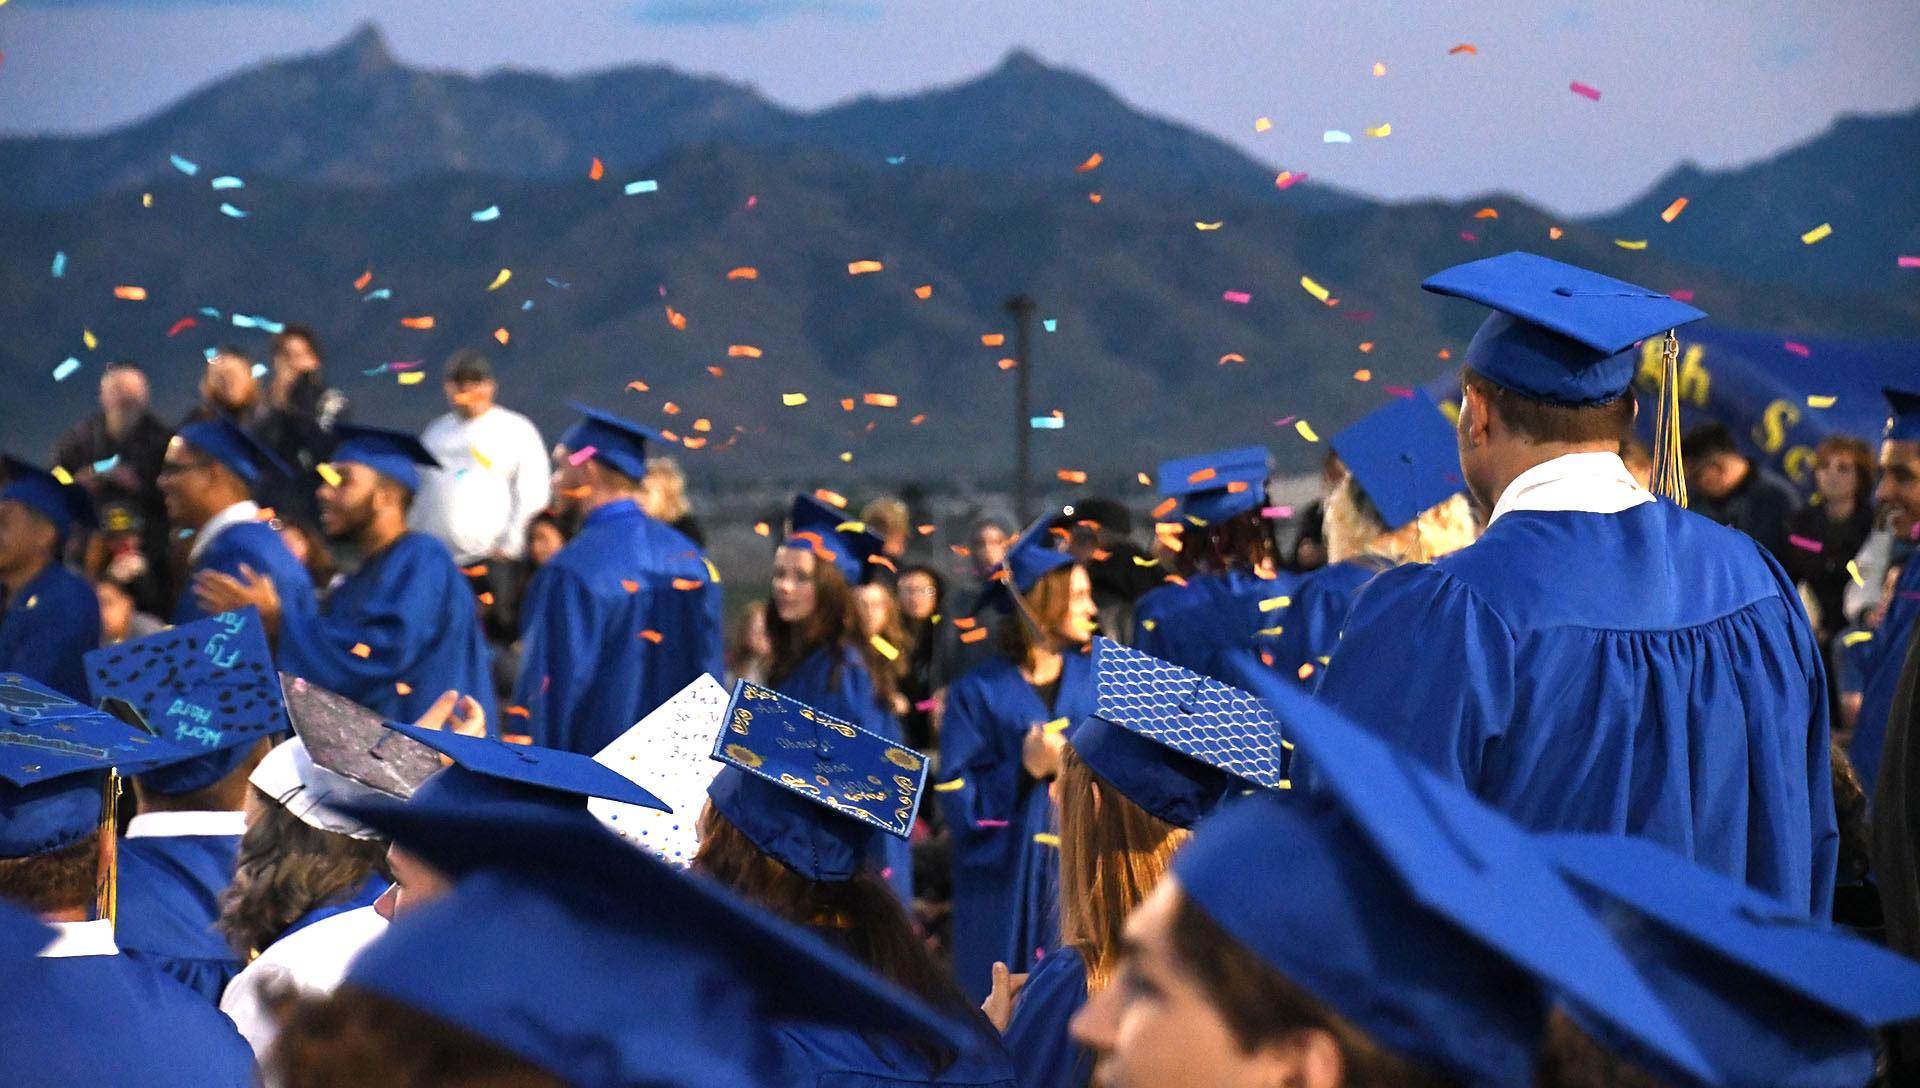 High school seniors won't be prevented from graduating | Kingman Daily Miner | Kingman, AZ